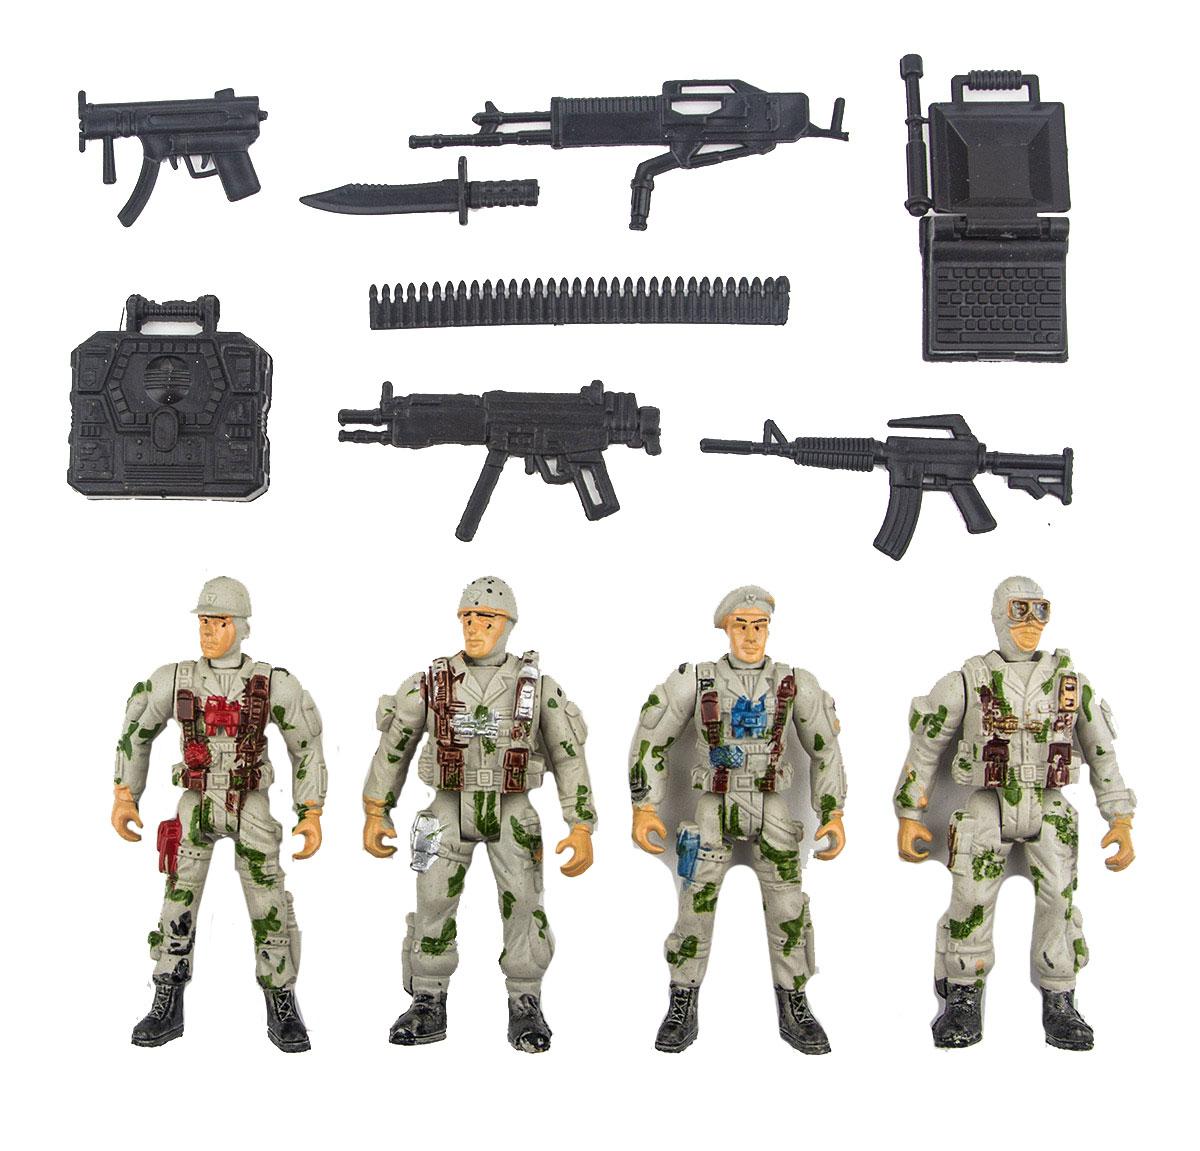 Battletime Набор солдатиков Отряд Гепард интернет магазин гепард